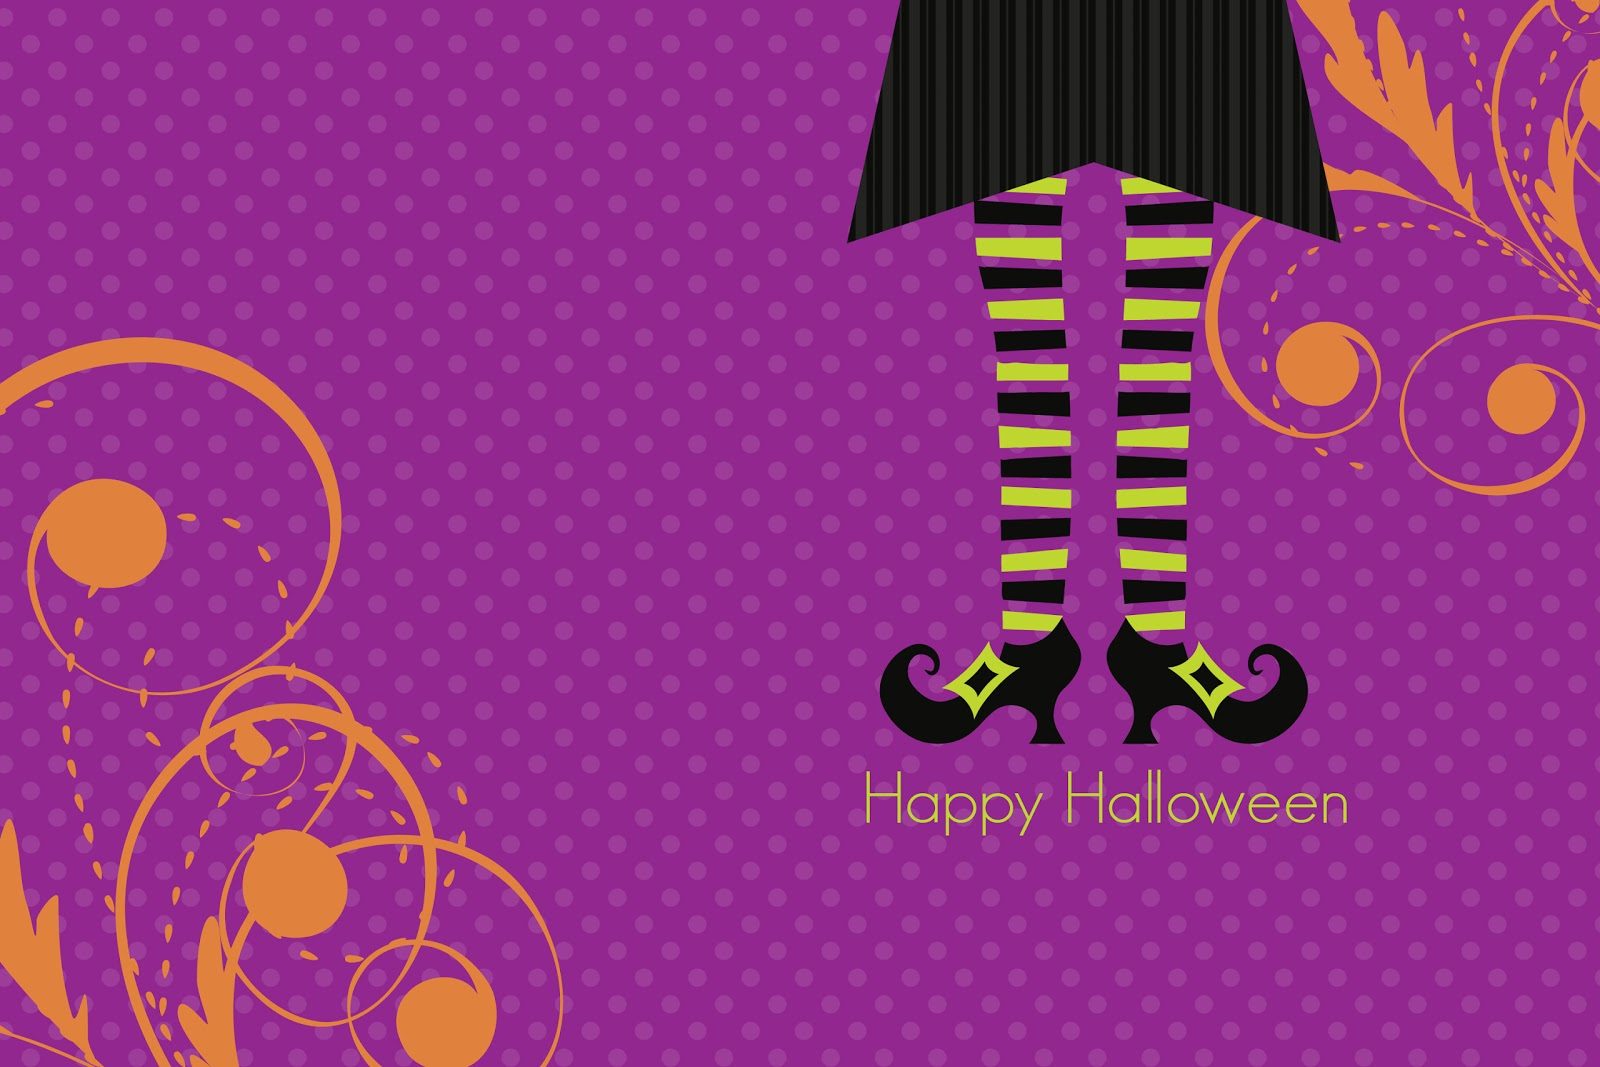 trololo blogg Cute Halloween Wallpaper Desktop 1600x1067